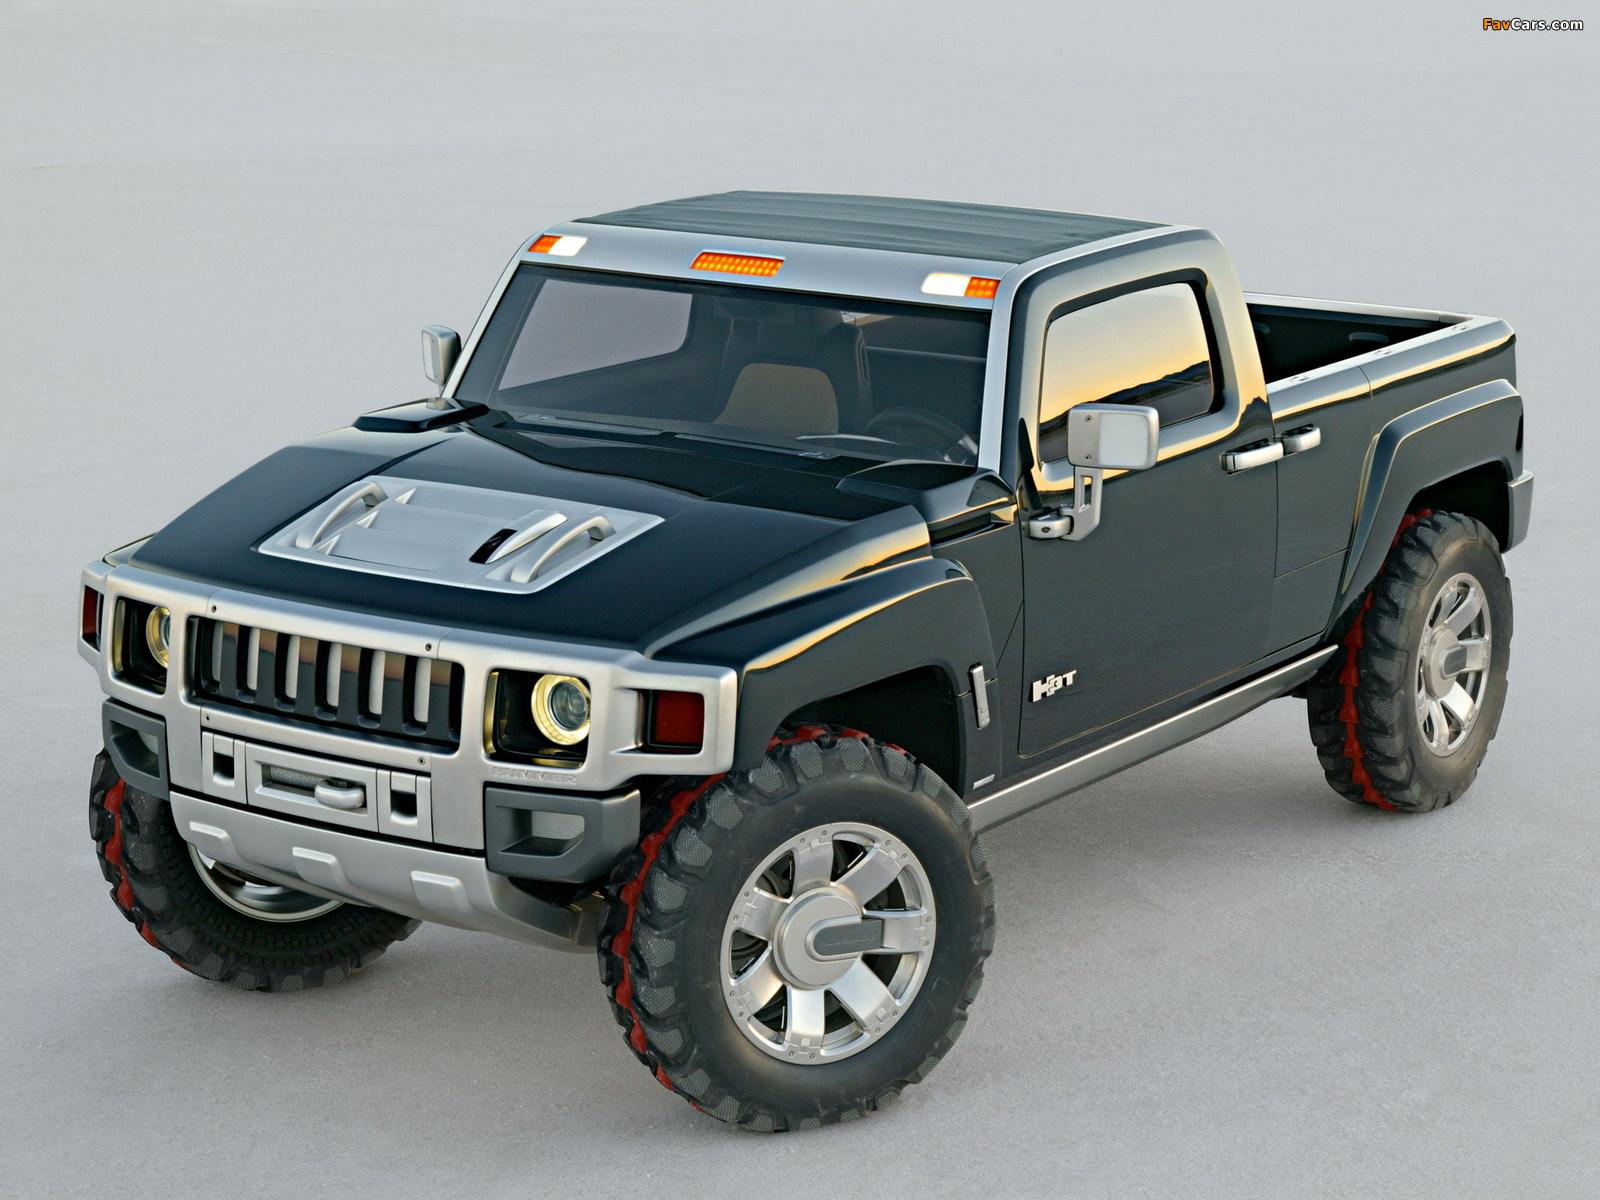 Hummer H3T Concept 2004 images (1600 x 1200)